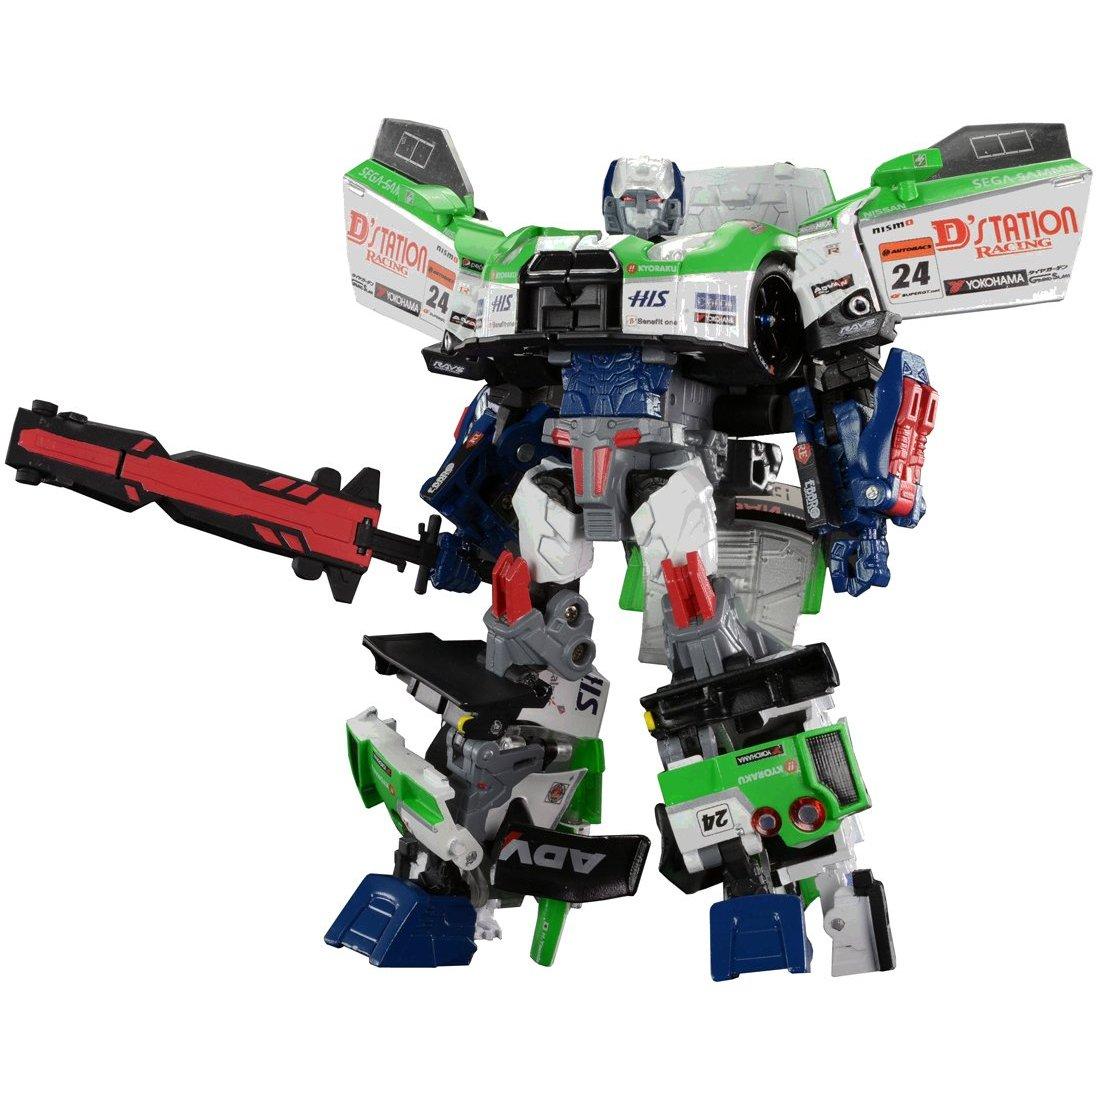 Transformers: Classics/Henkei 2006-2007, Universe 2003-2008, Generations/United (CHUG), Reveal the Shield, Alternity, Binaltech (Alternator) & Power Core Combiners - Page 38 71prkEYMq2BL_AA1100__1366806823